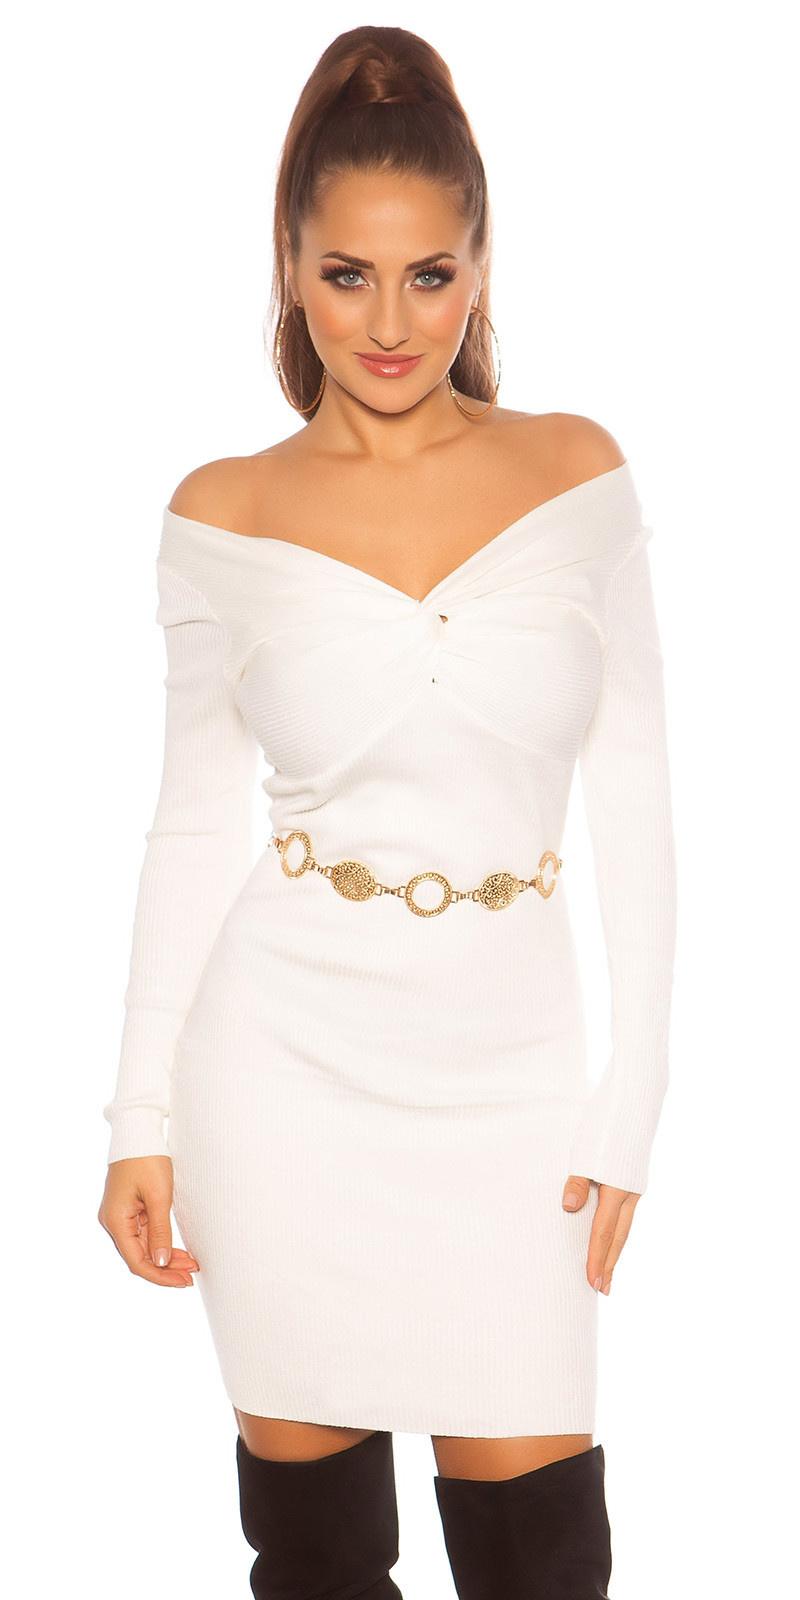 Sexy gebreide jurk wikkel look wit